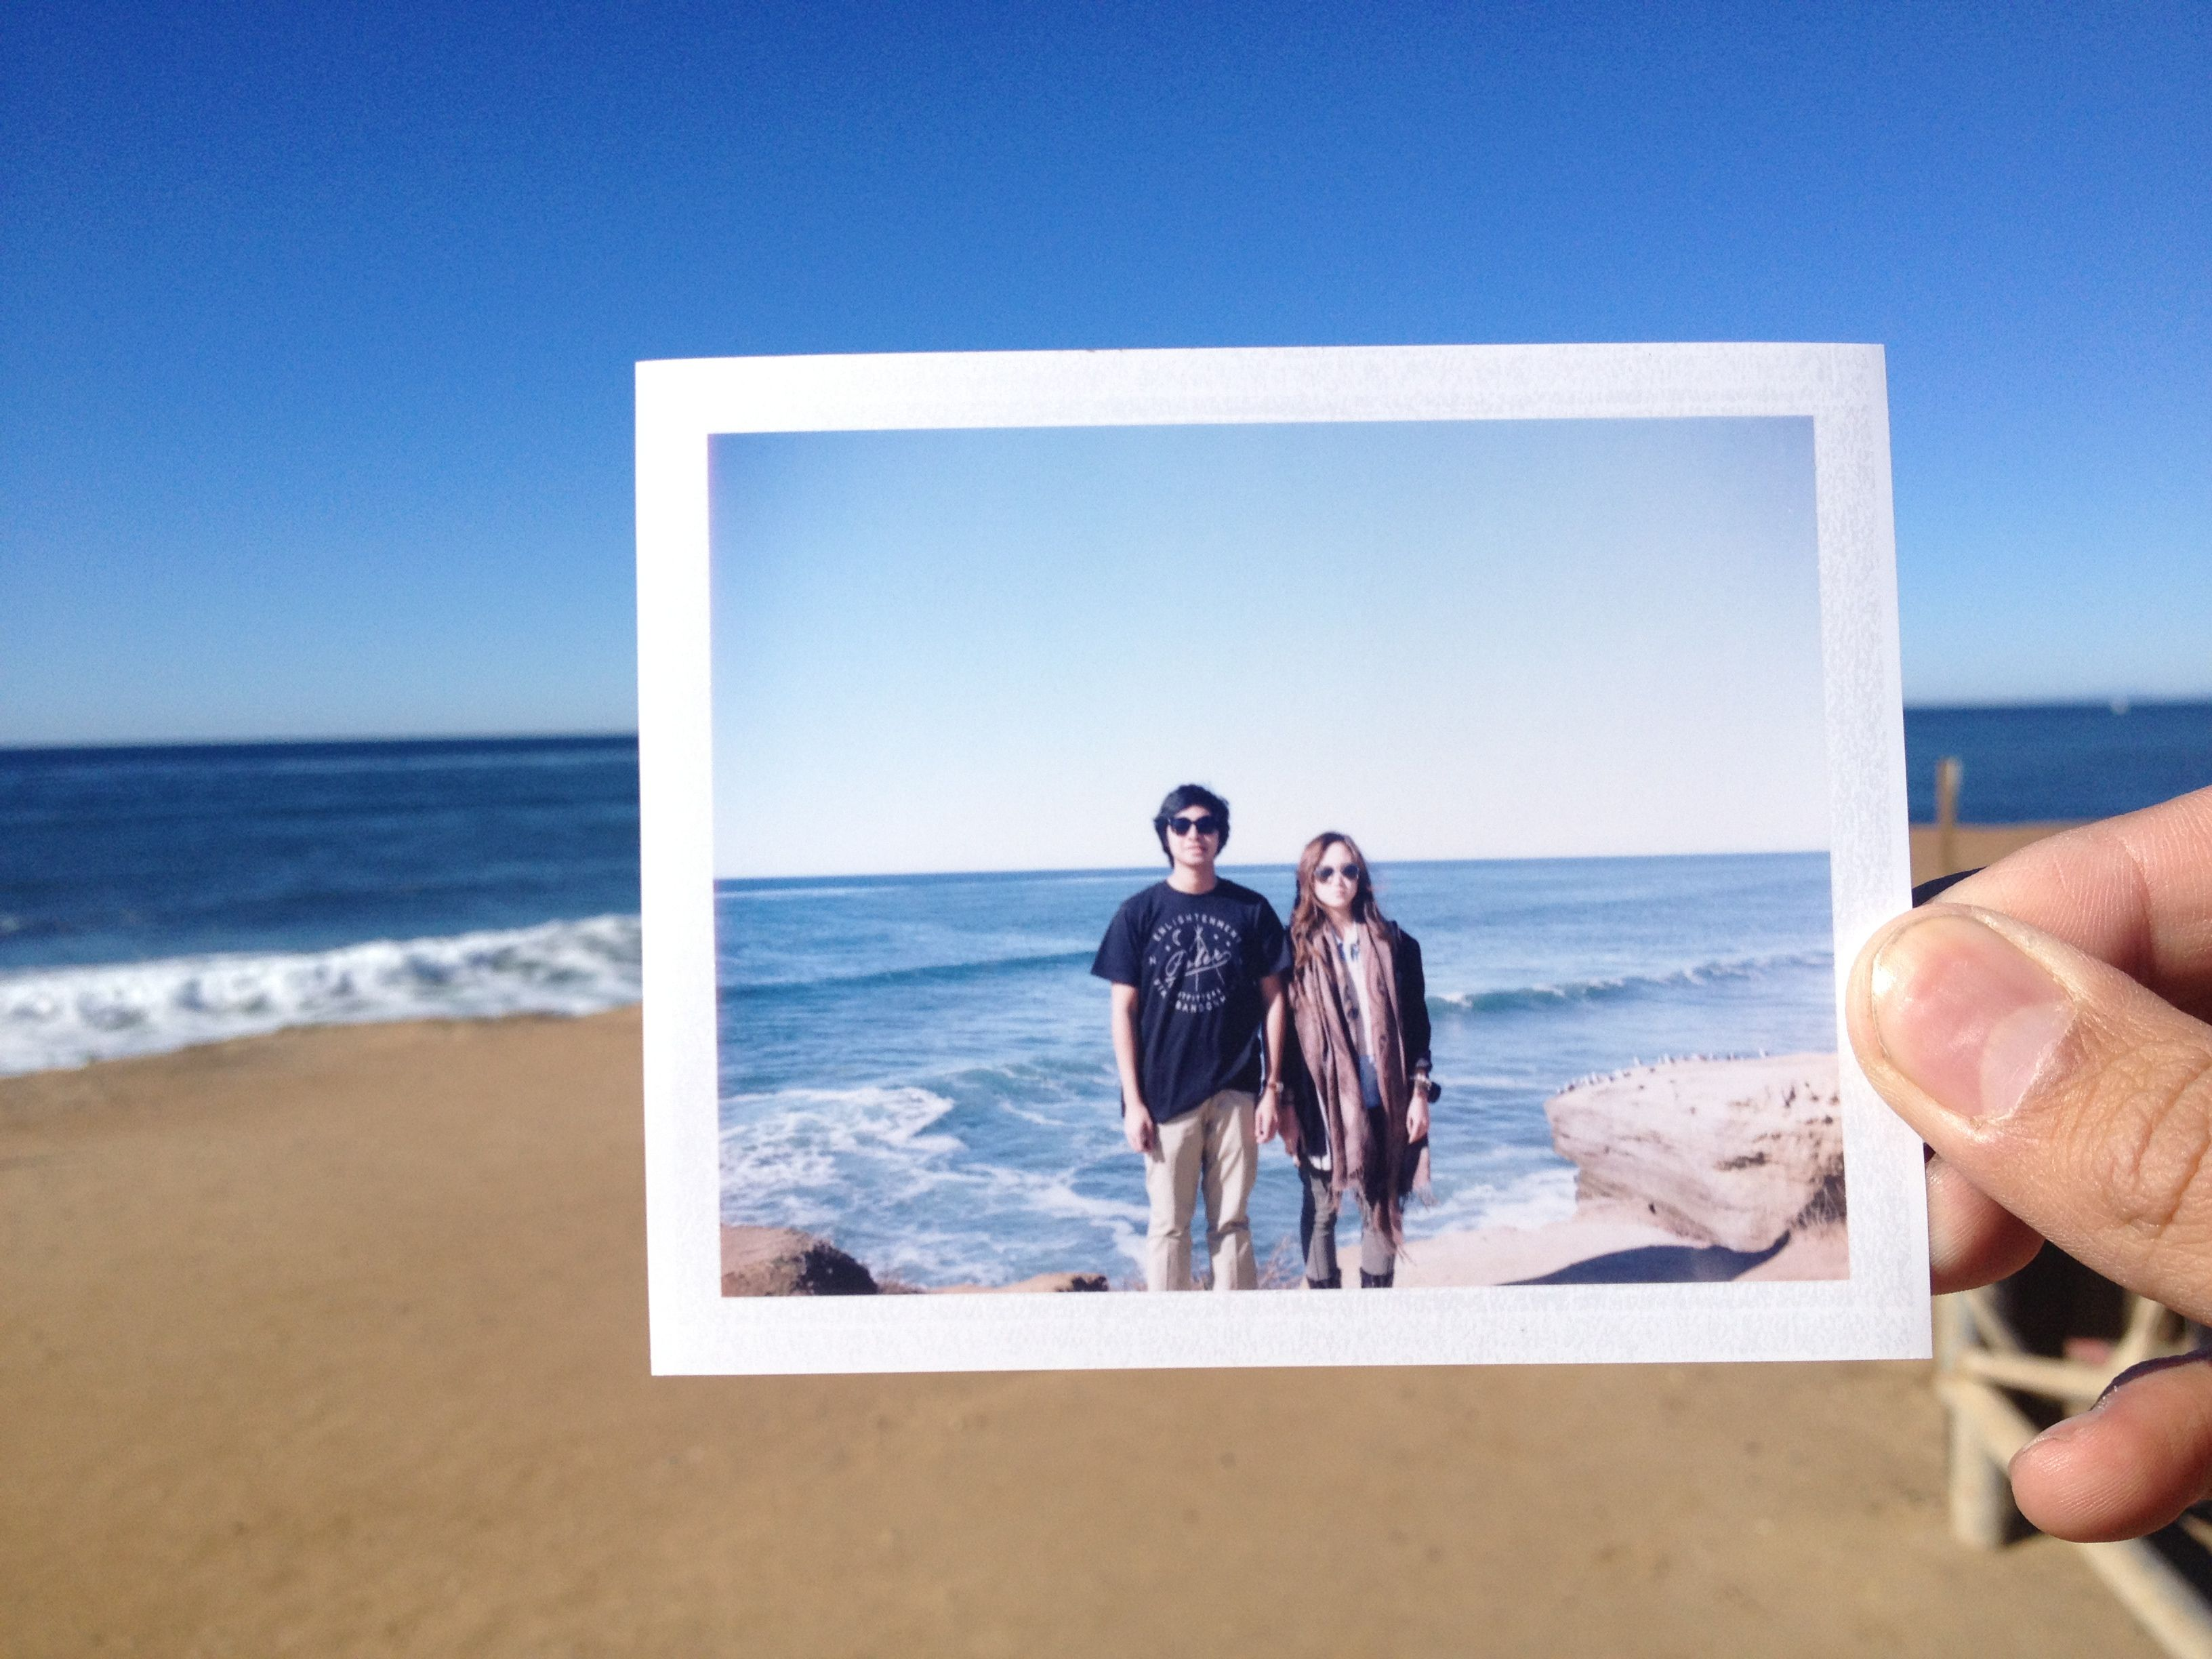 Sunset Cliffs Natural Park, San Diego. Taken with Polaroid